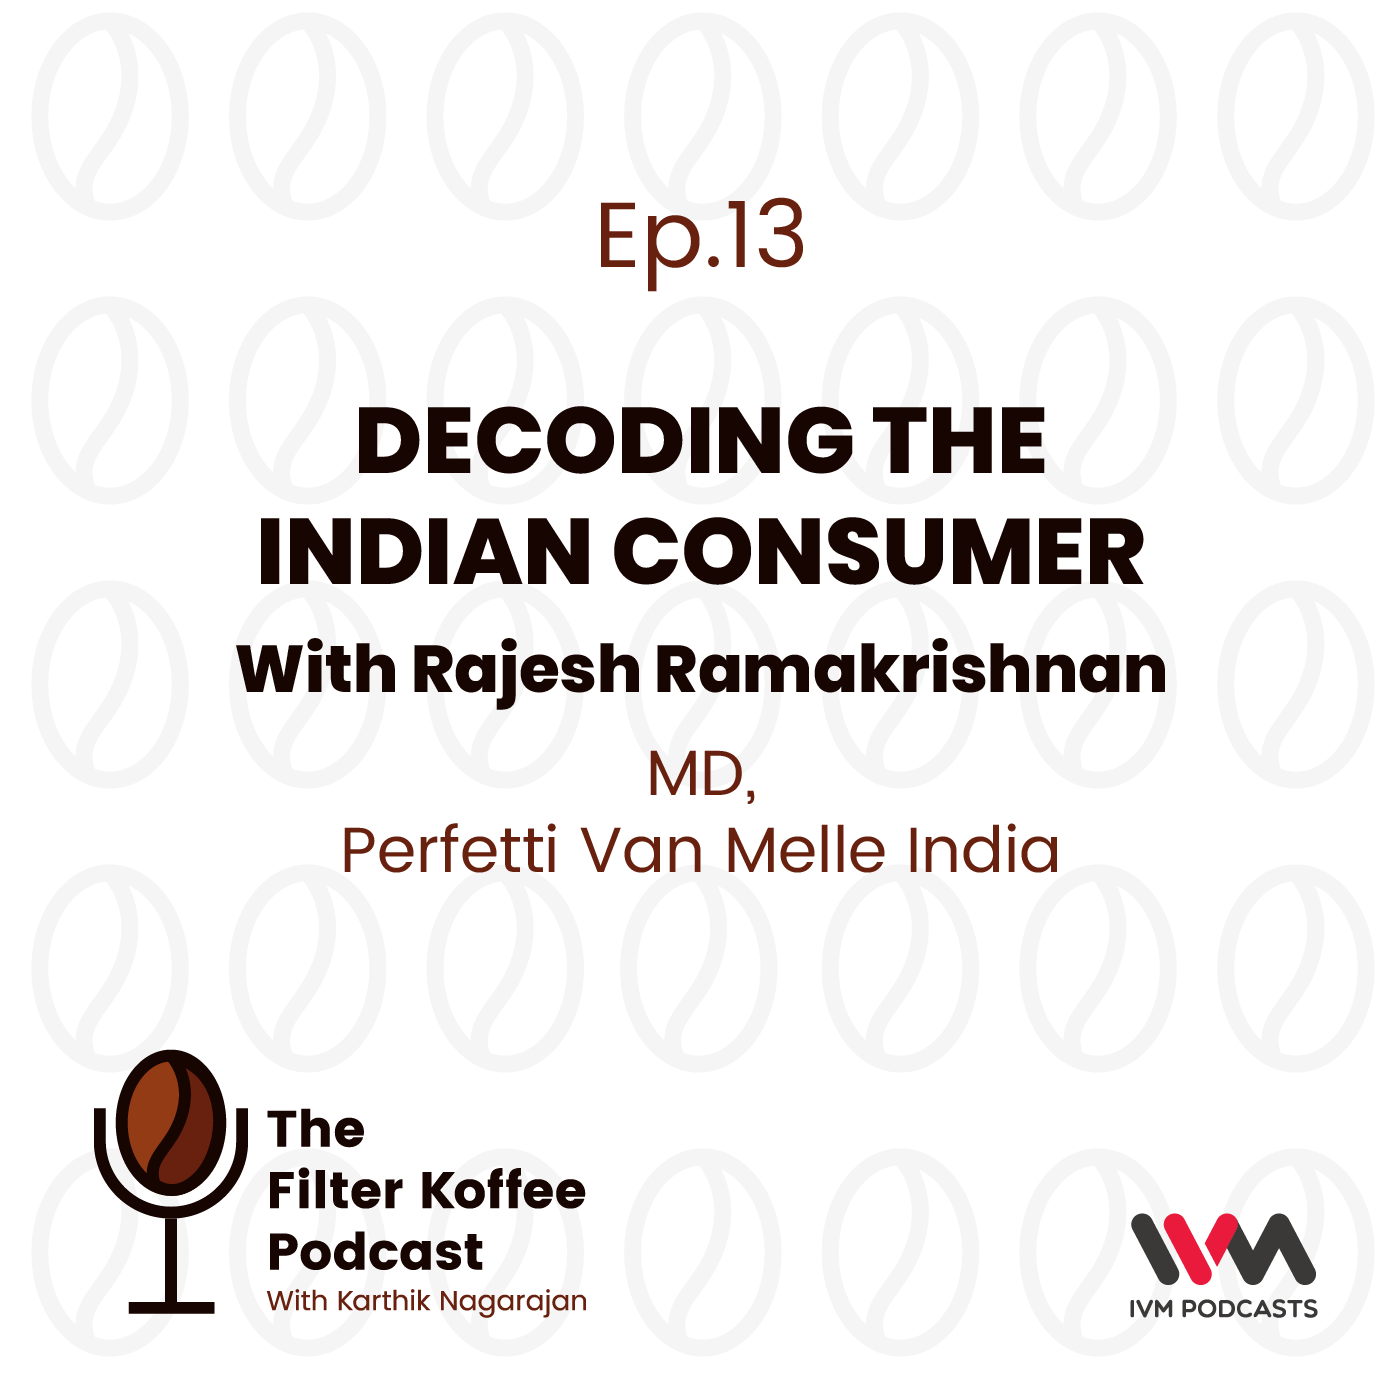 Ep .13: Decoding The Indian Consumer with Rajesh Ramakrishnan